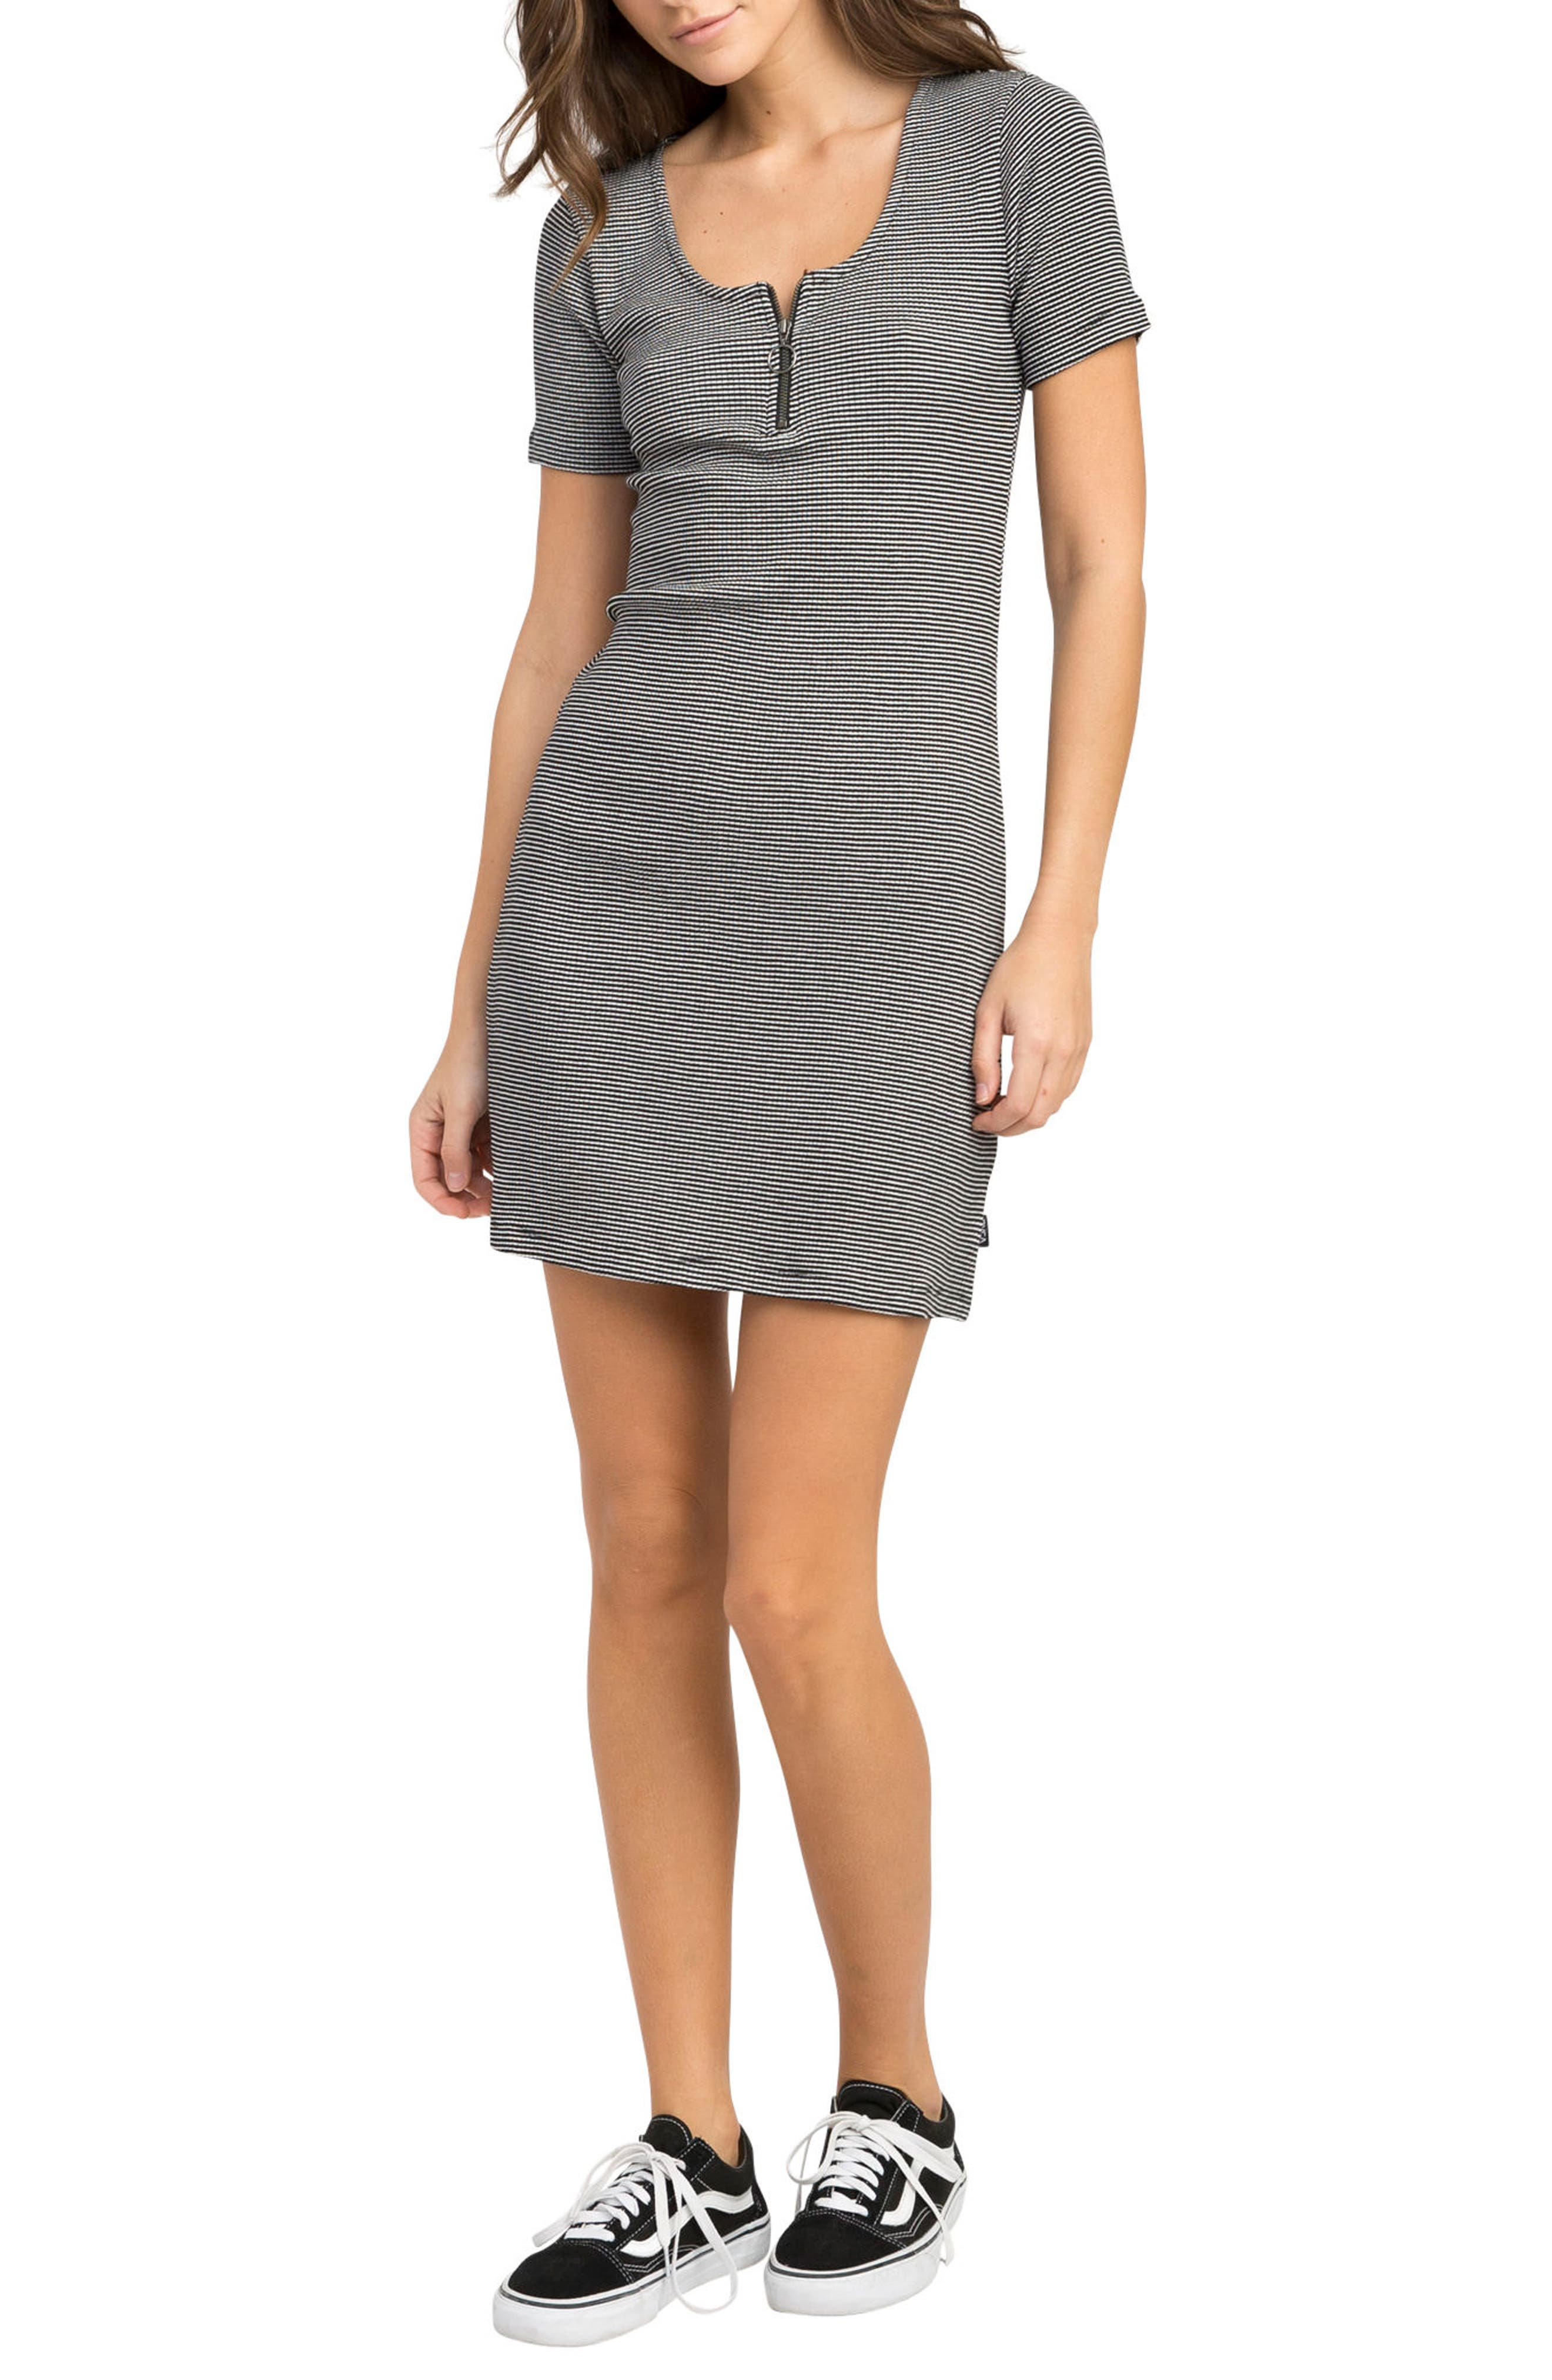 Alternate Image 1 Selected - RVCA Zip It Striped Dress